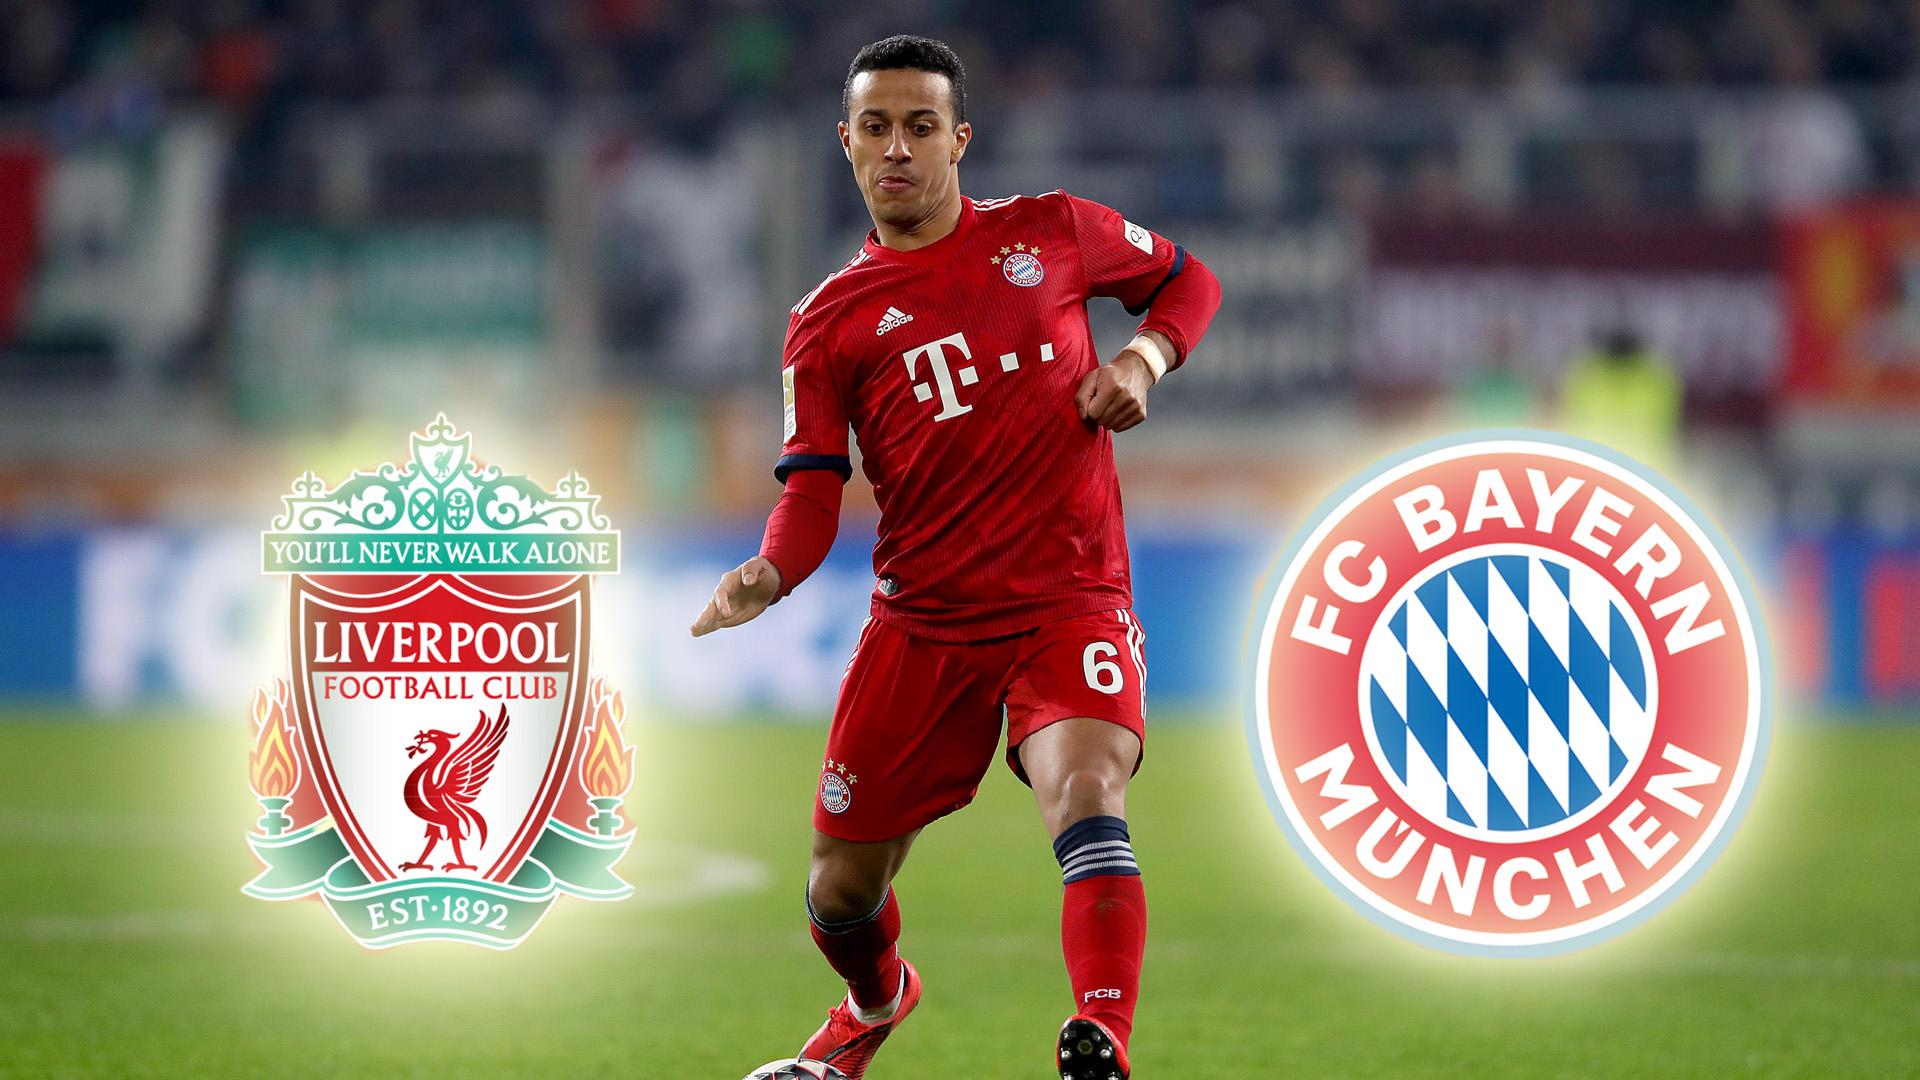 Bayern Liverpol